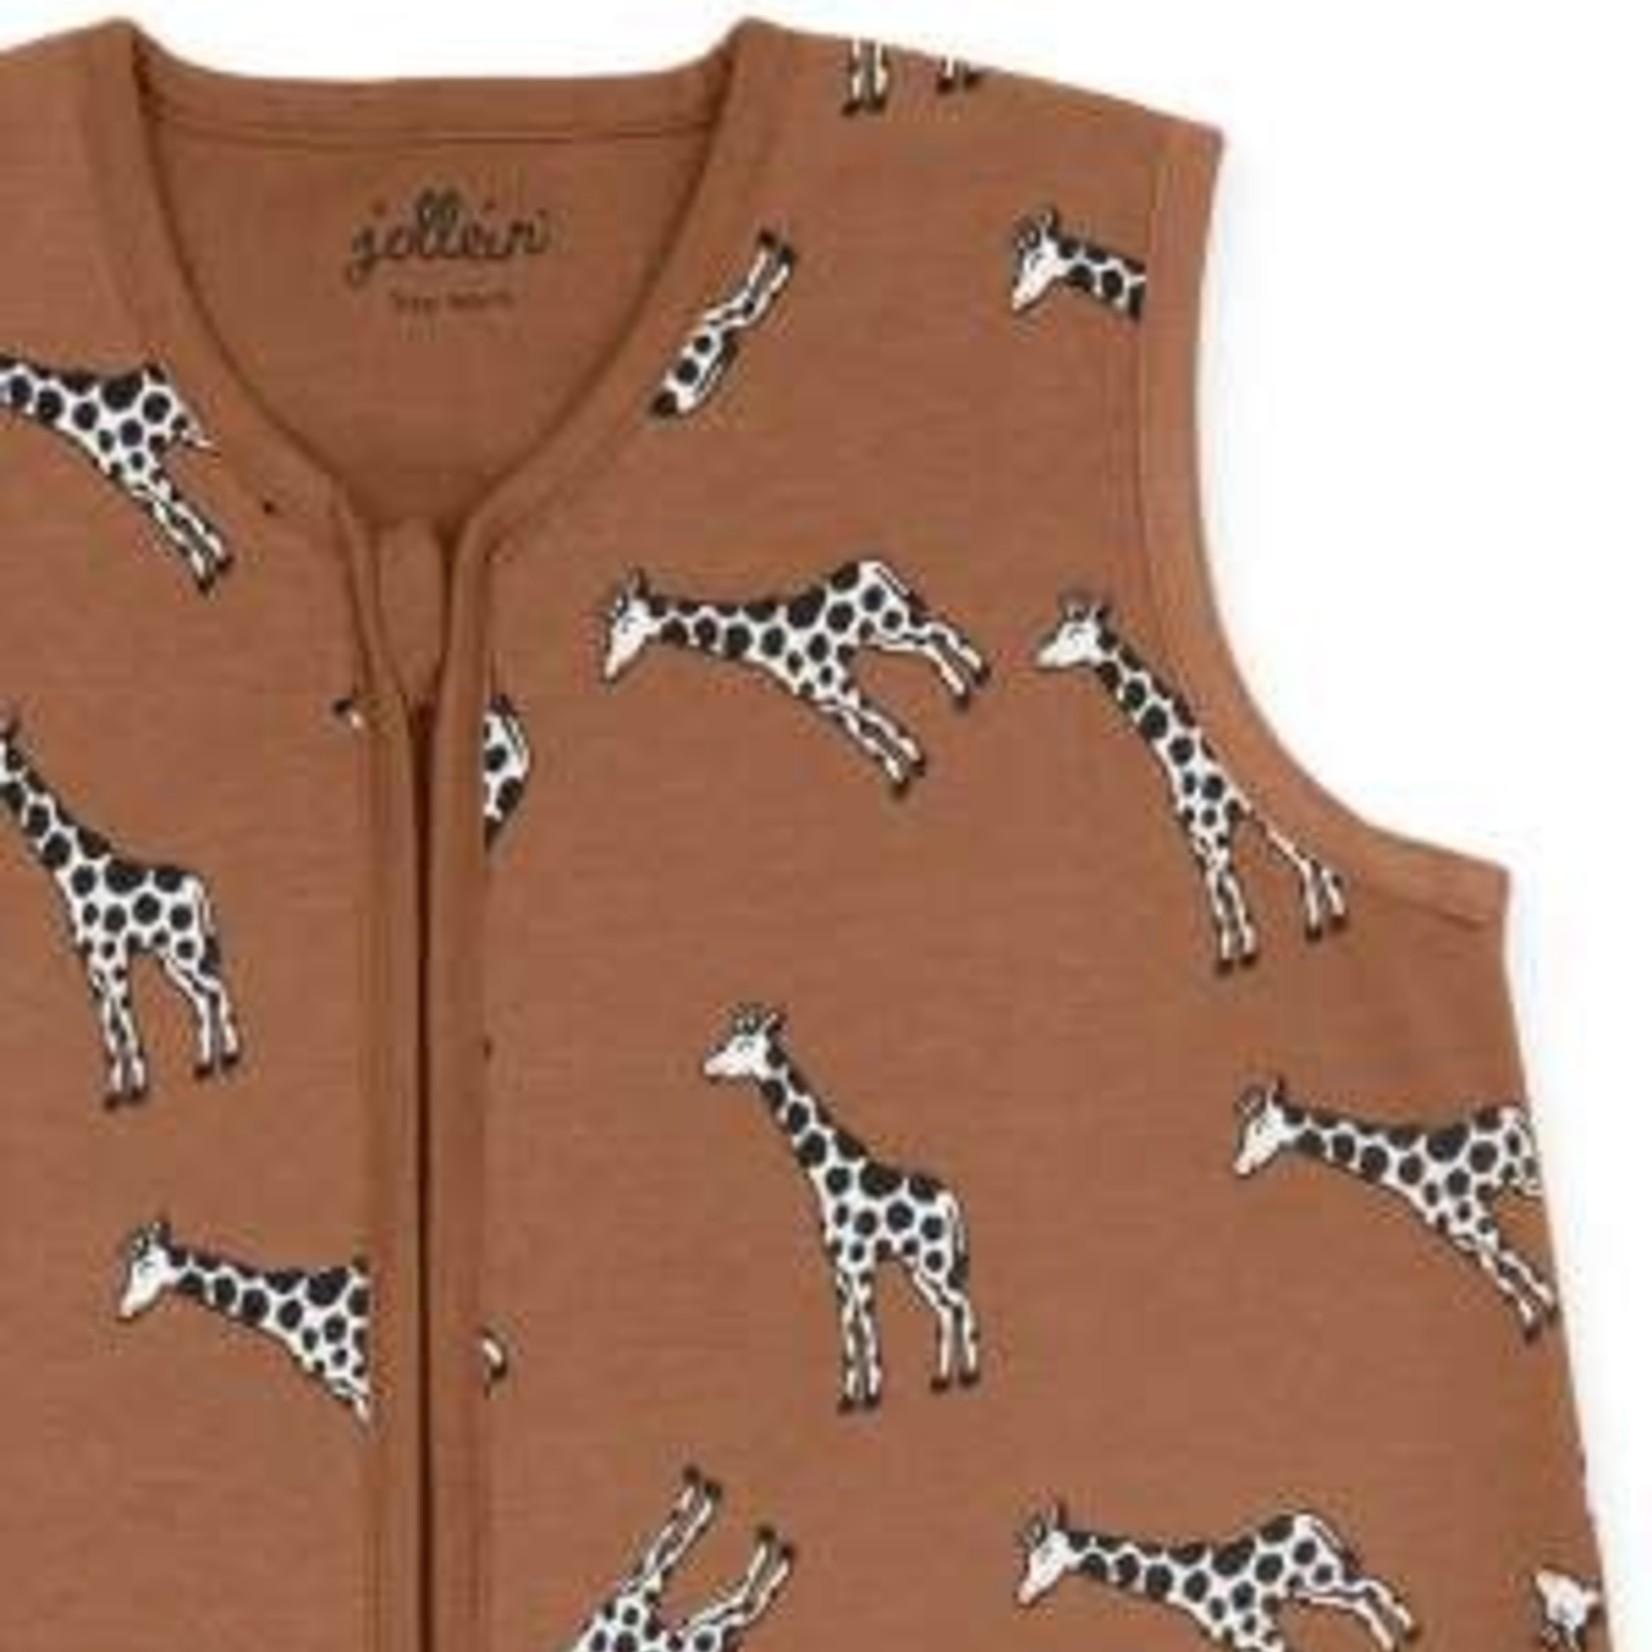 Jollein Jollein Slaapzak Zomer Giraf Caramel